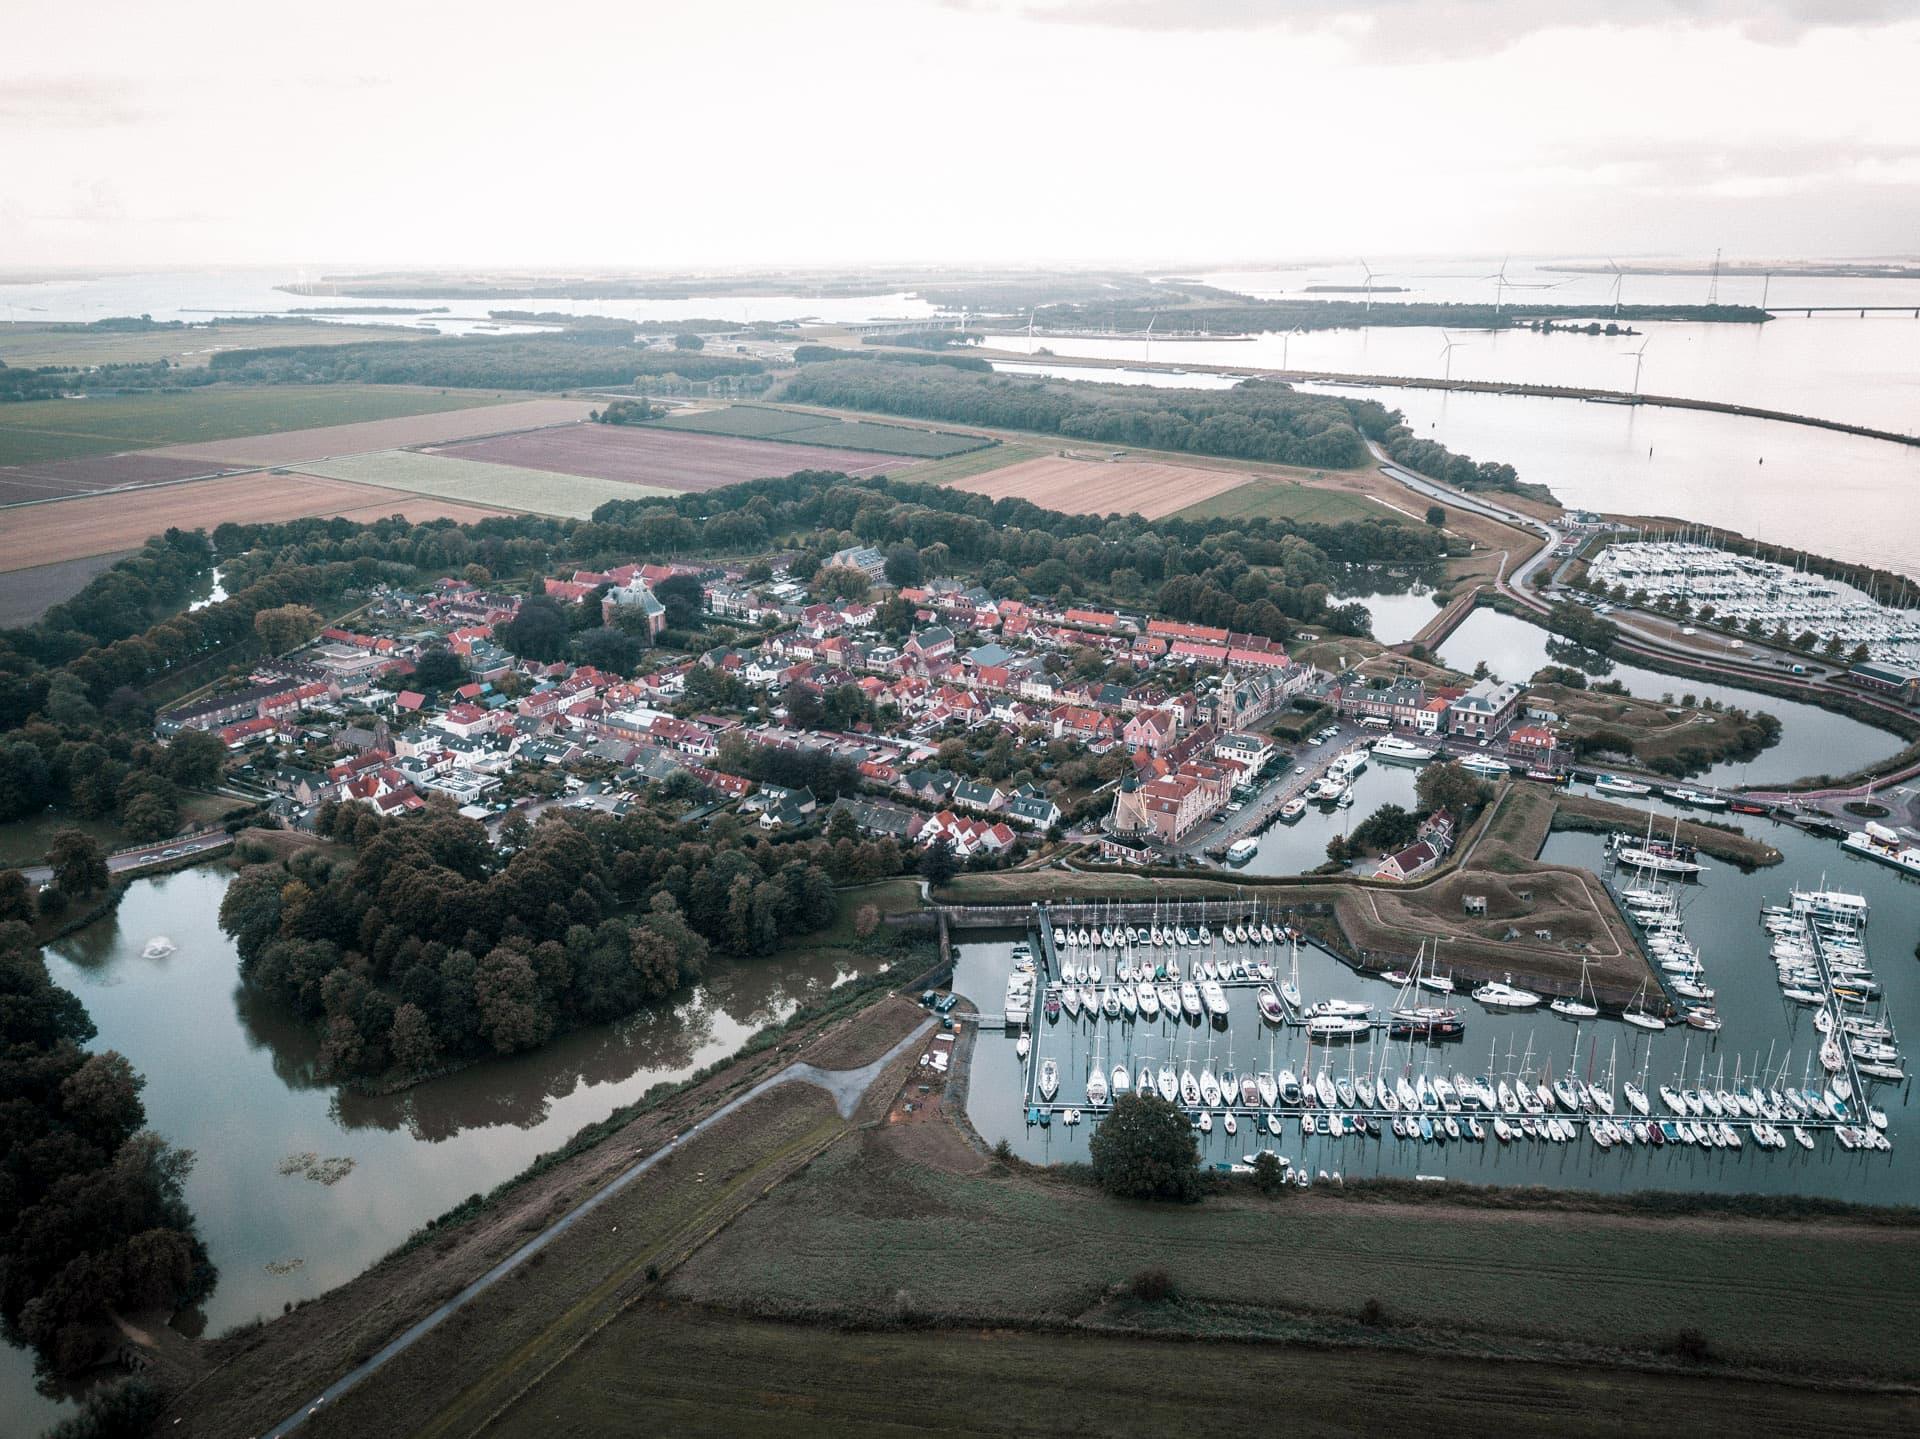 Une vue aérienne de la forteresse Vauban de Willemstad